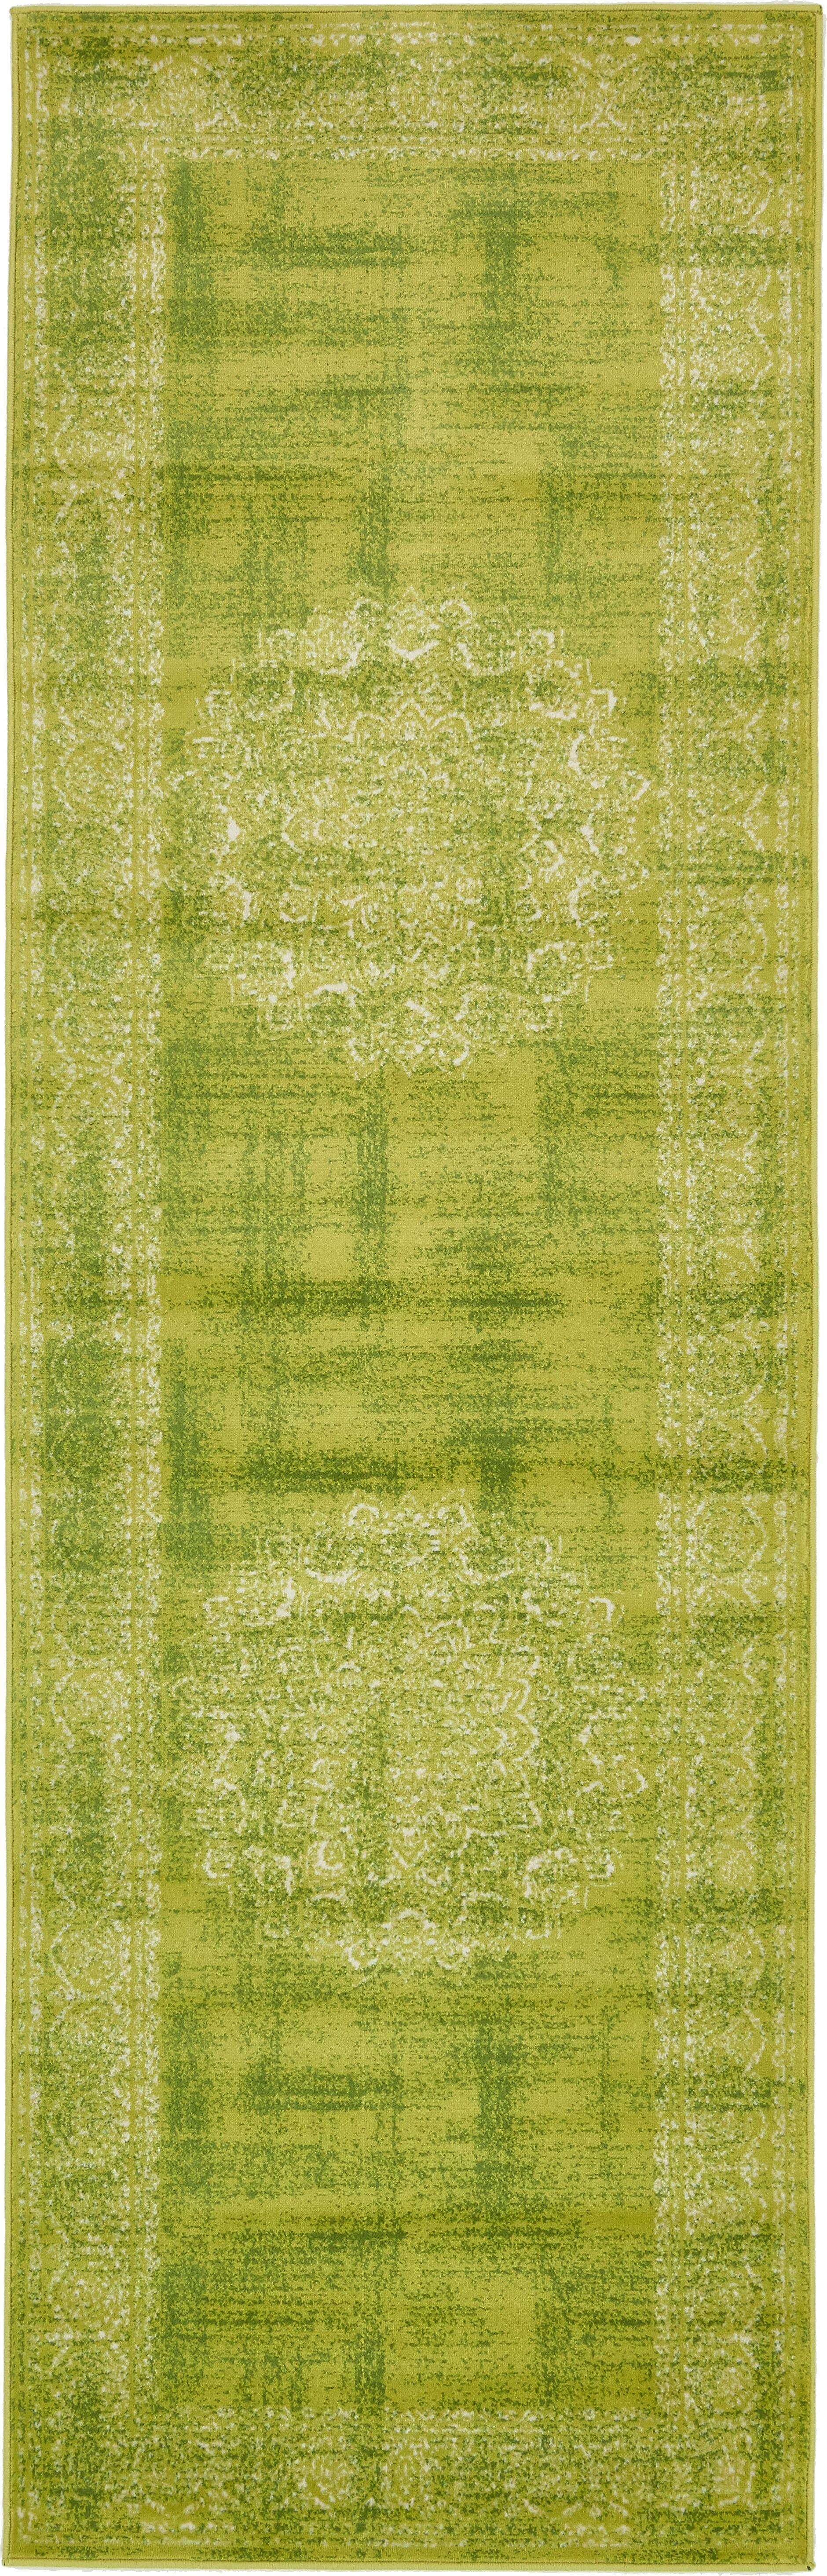 Neuilly Beige/Green Area Rug Rug Size: Runner 3' x 9'1